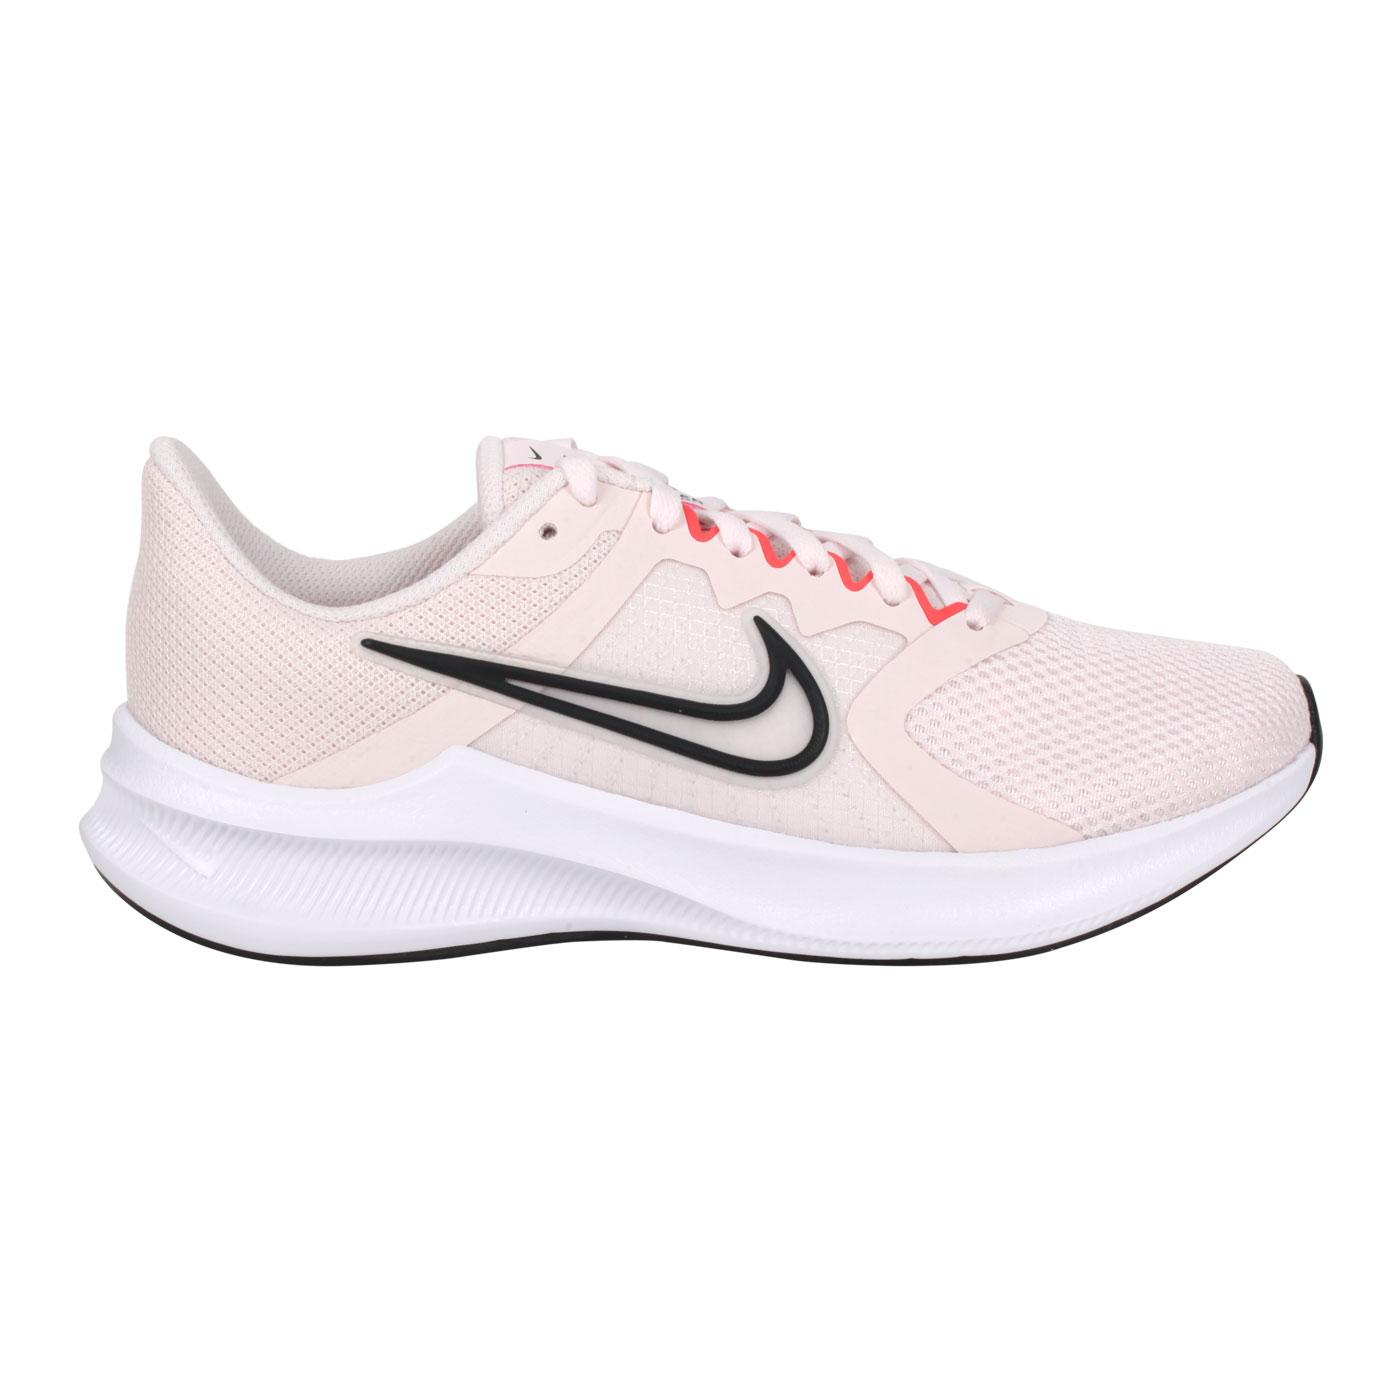 NIKE 女款運動休閒鞋  @WMNS DOWNSHIFTER 11@CW3413601 - 粉紅黑